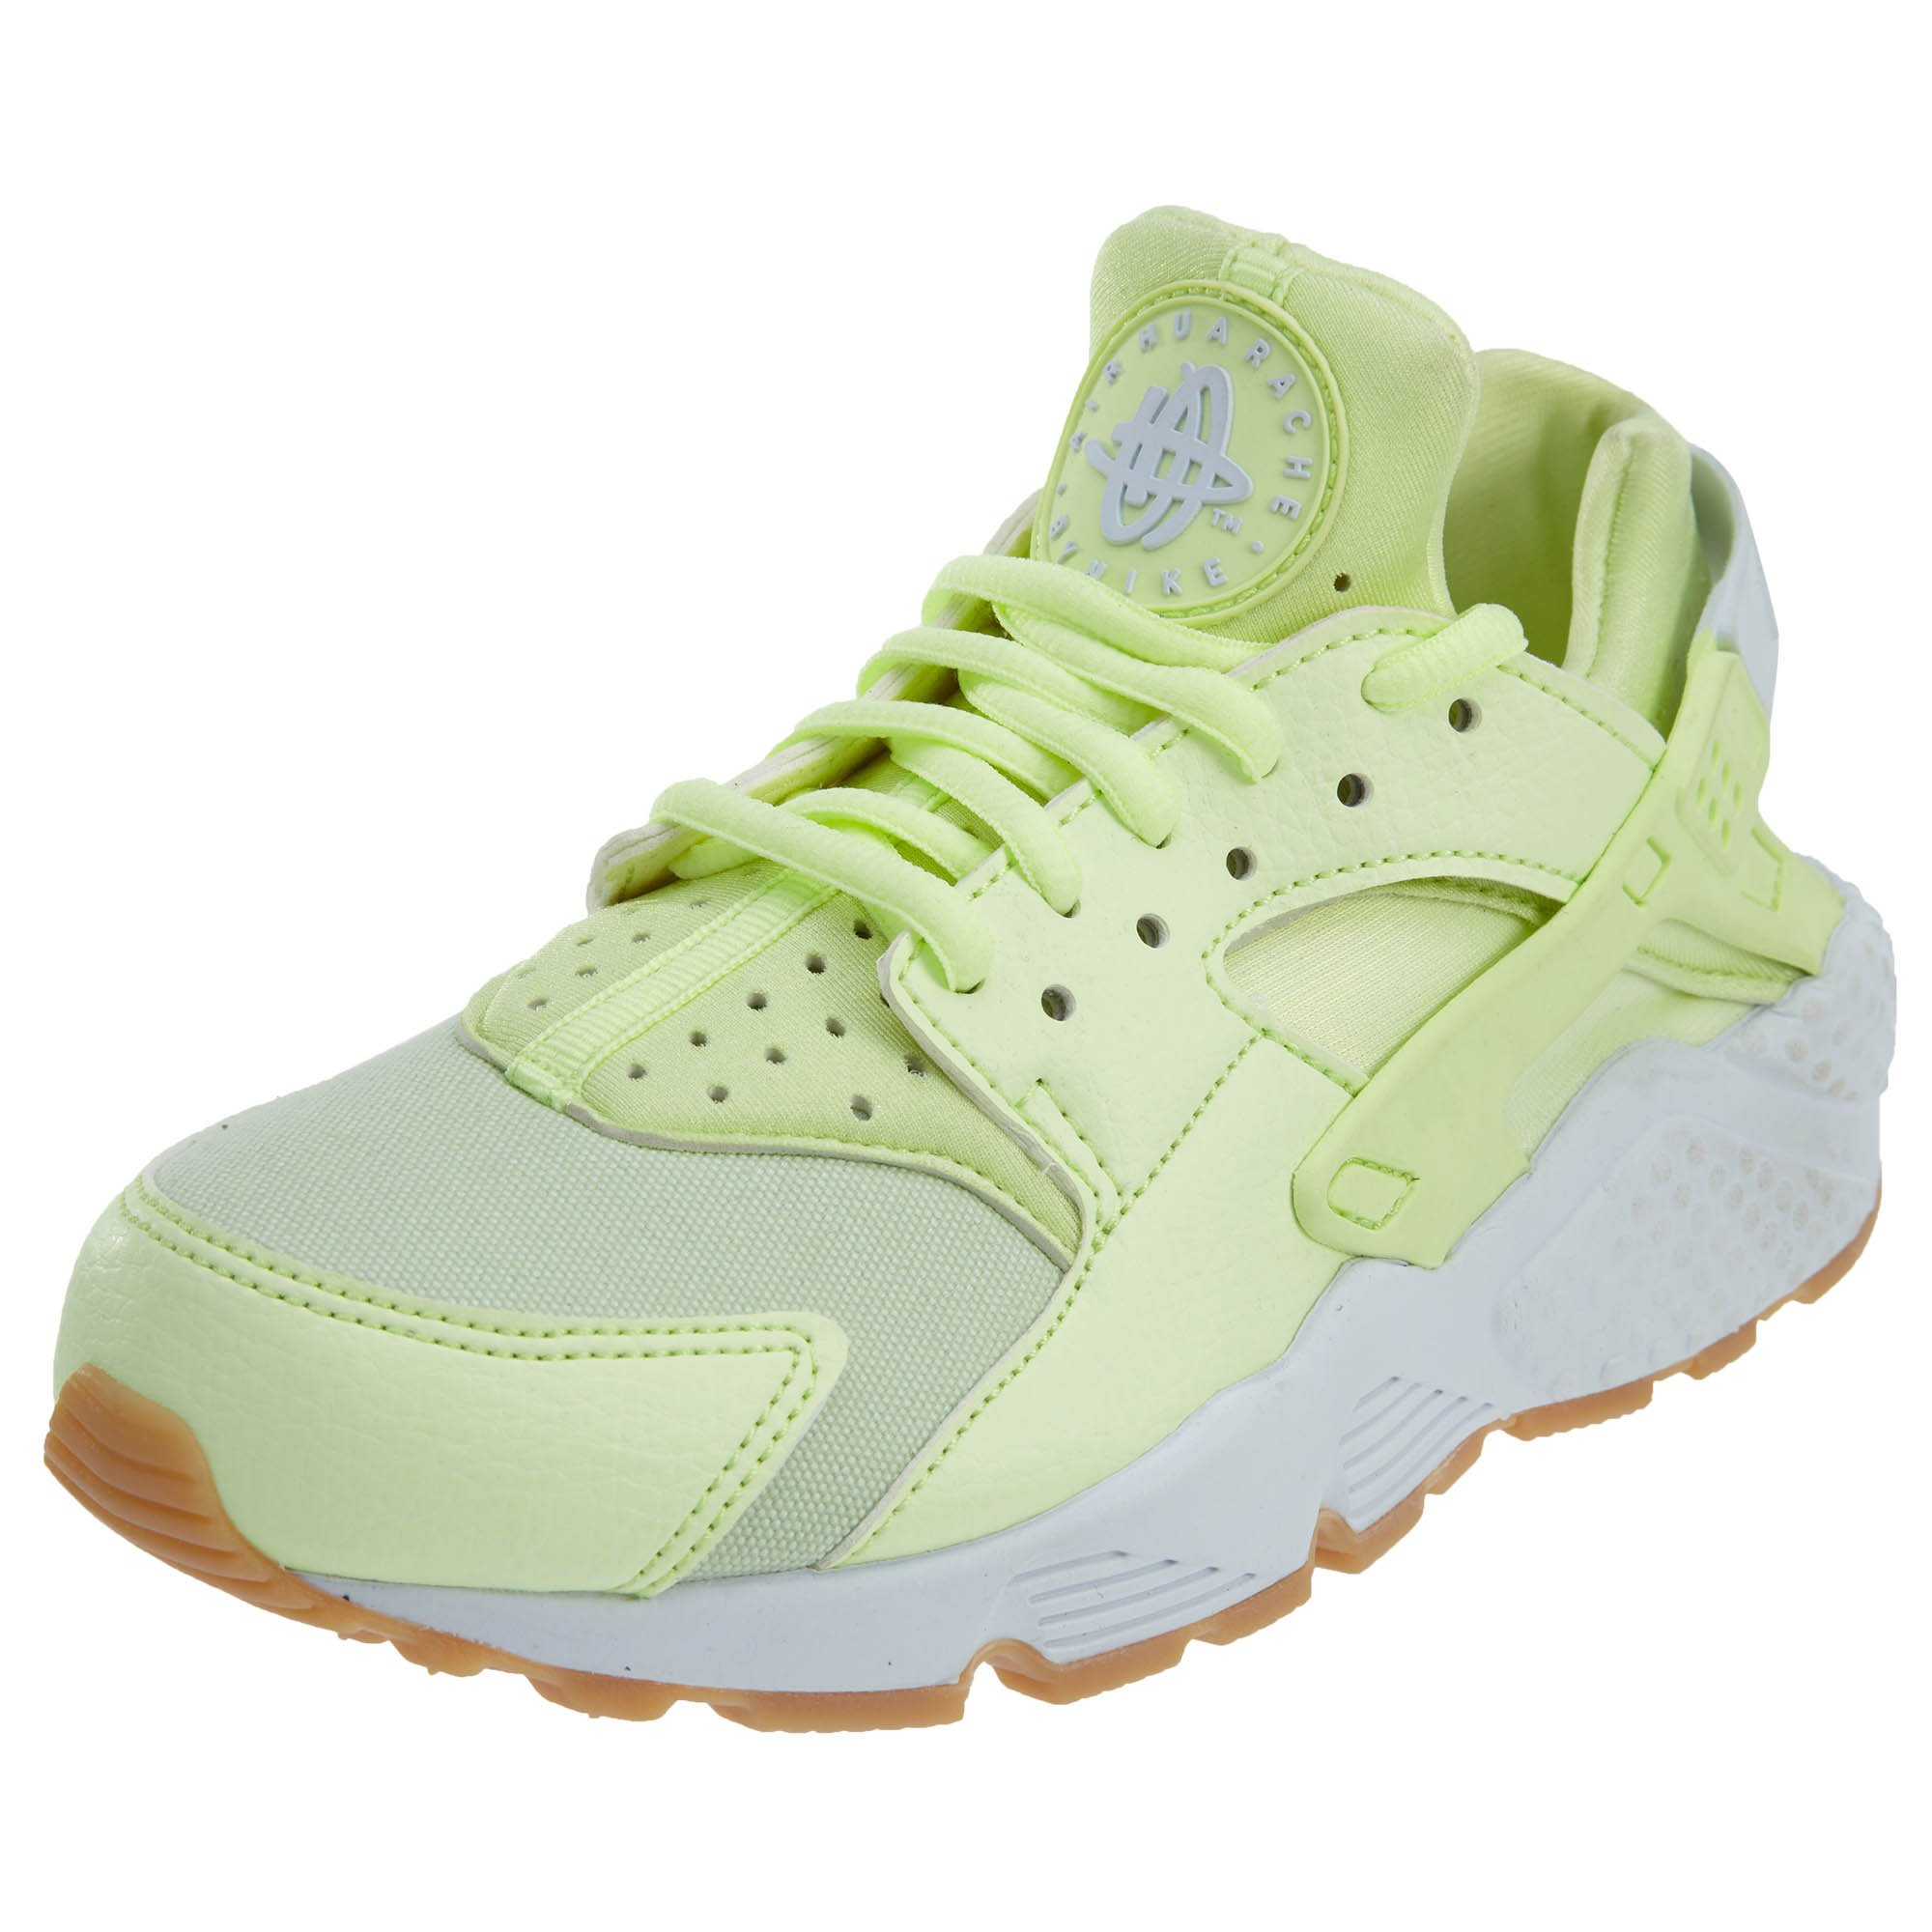 Nike Air Huarache Run Womens Style: 634835-702 Size: 11.5 by NIKE